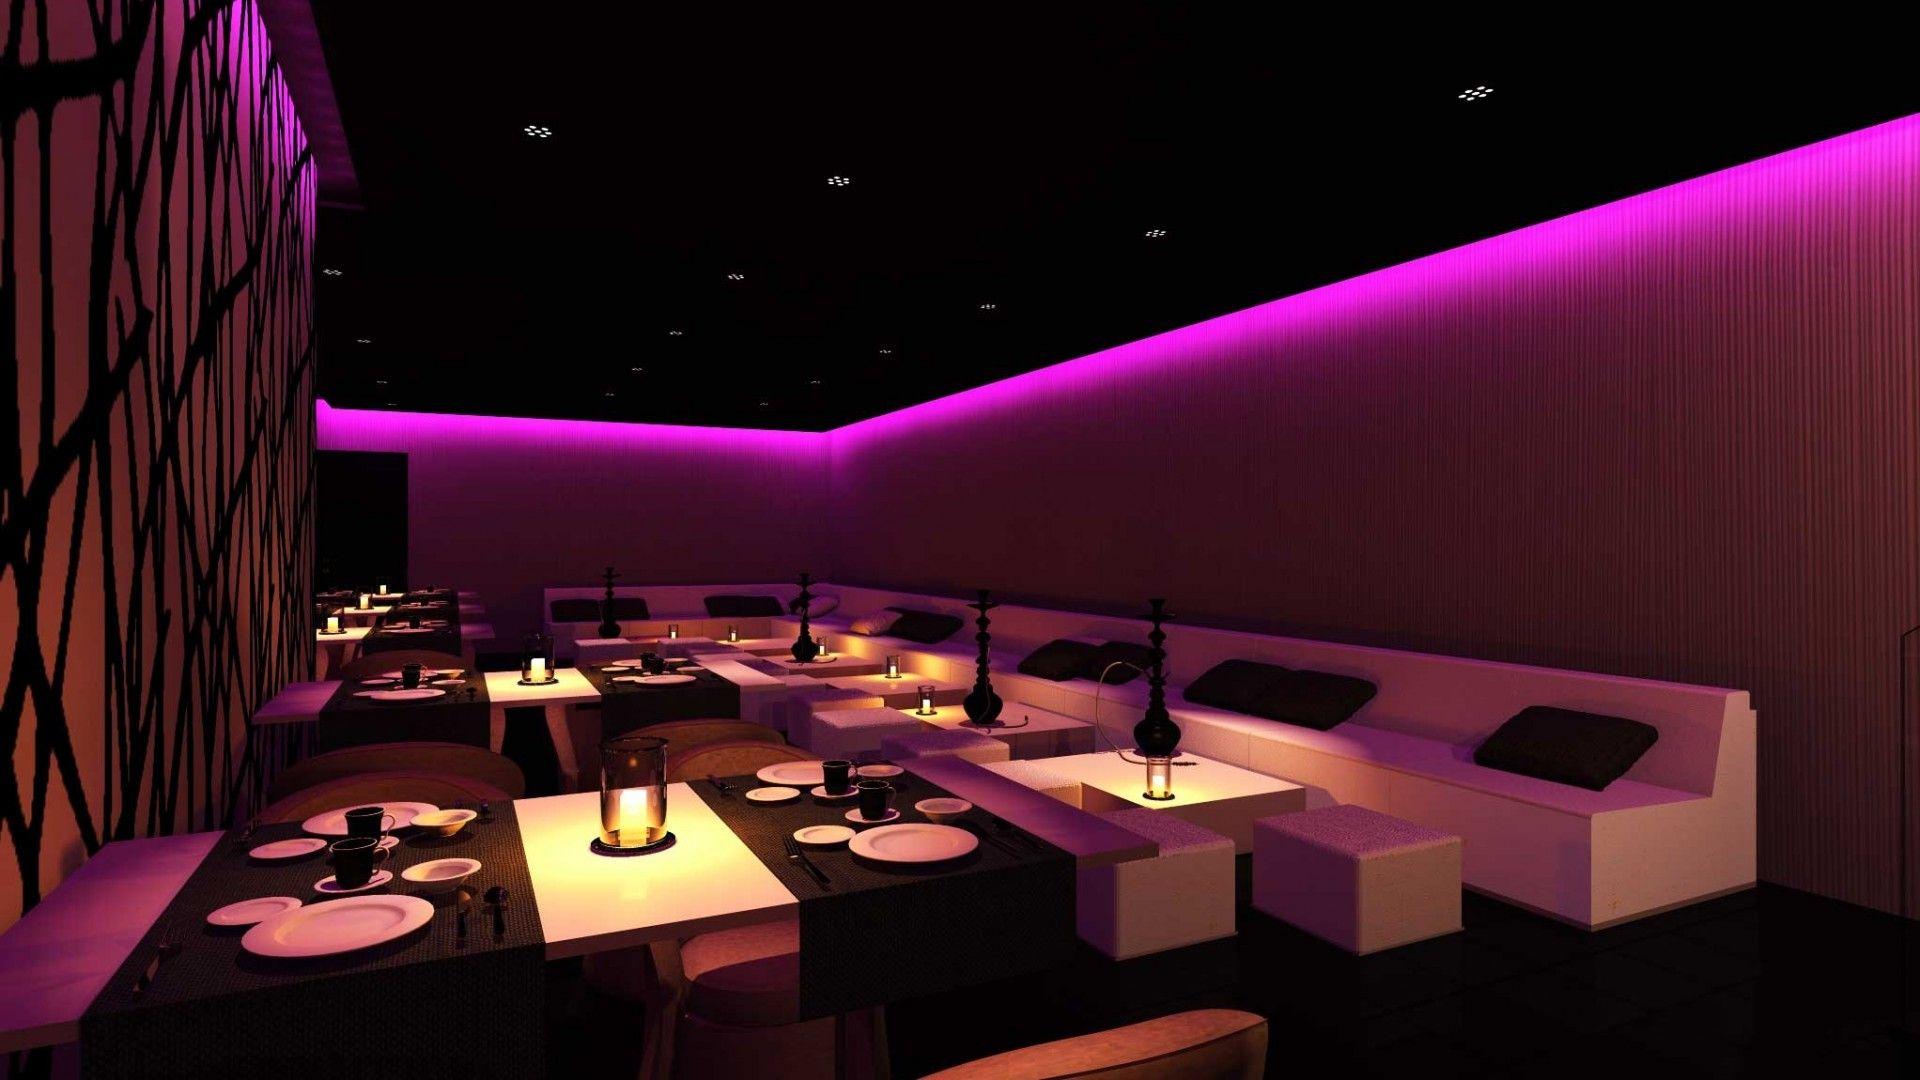 Lounge Wallpapers 2 whb #LoungeWallpapers #Lounge #InteriorDesign ...